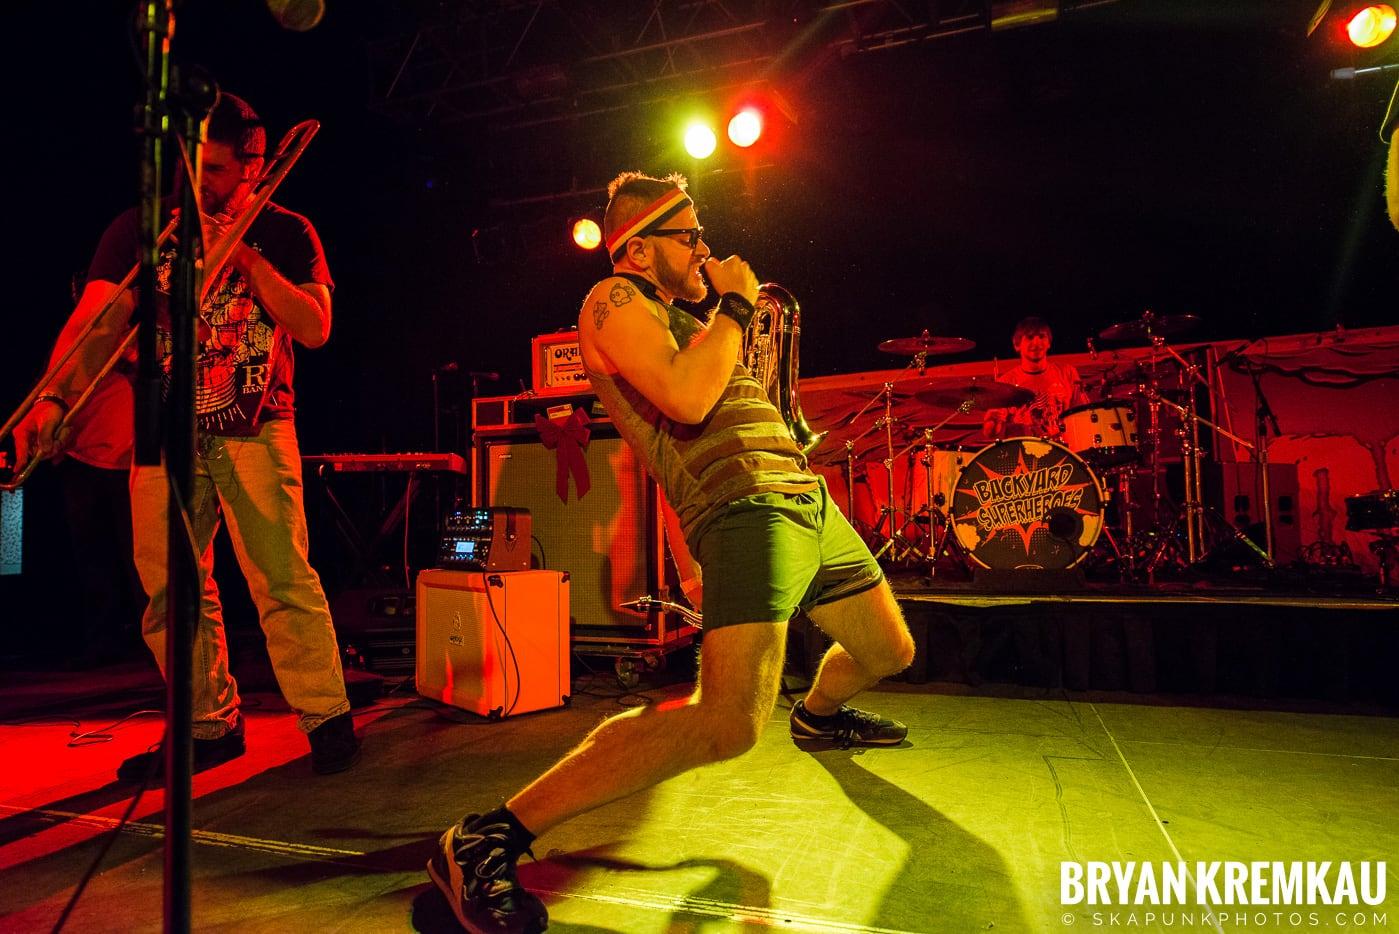 Backyard Superheroes @ Starland Ballroom, Sayreville, NJ - 11.23.18 (10)